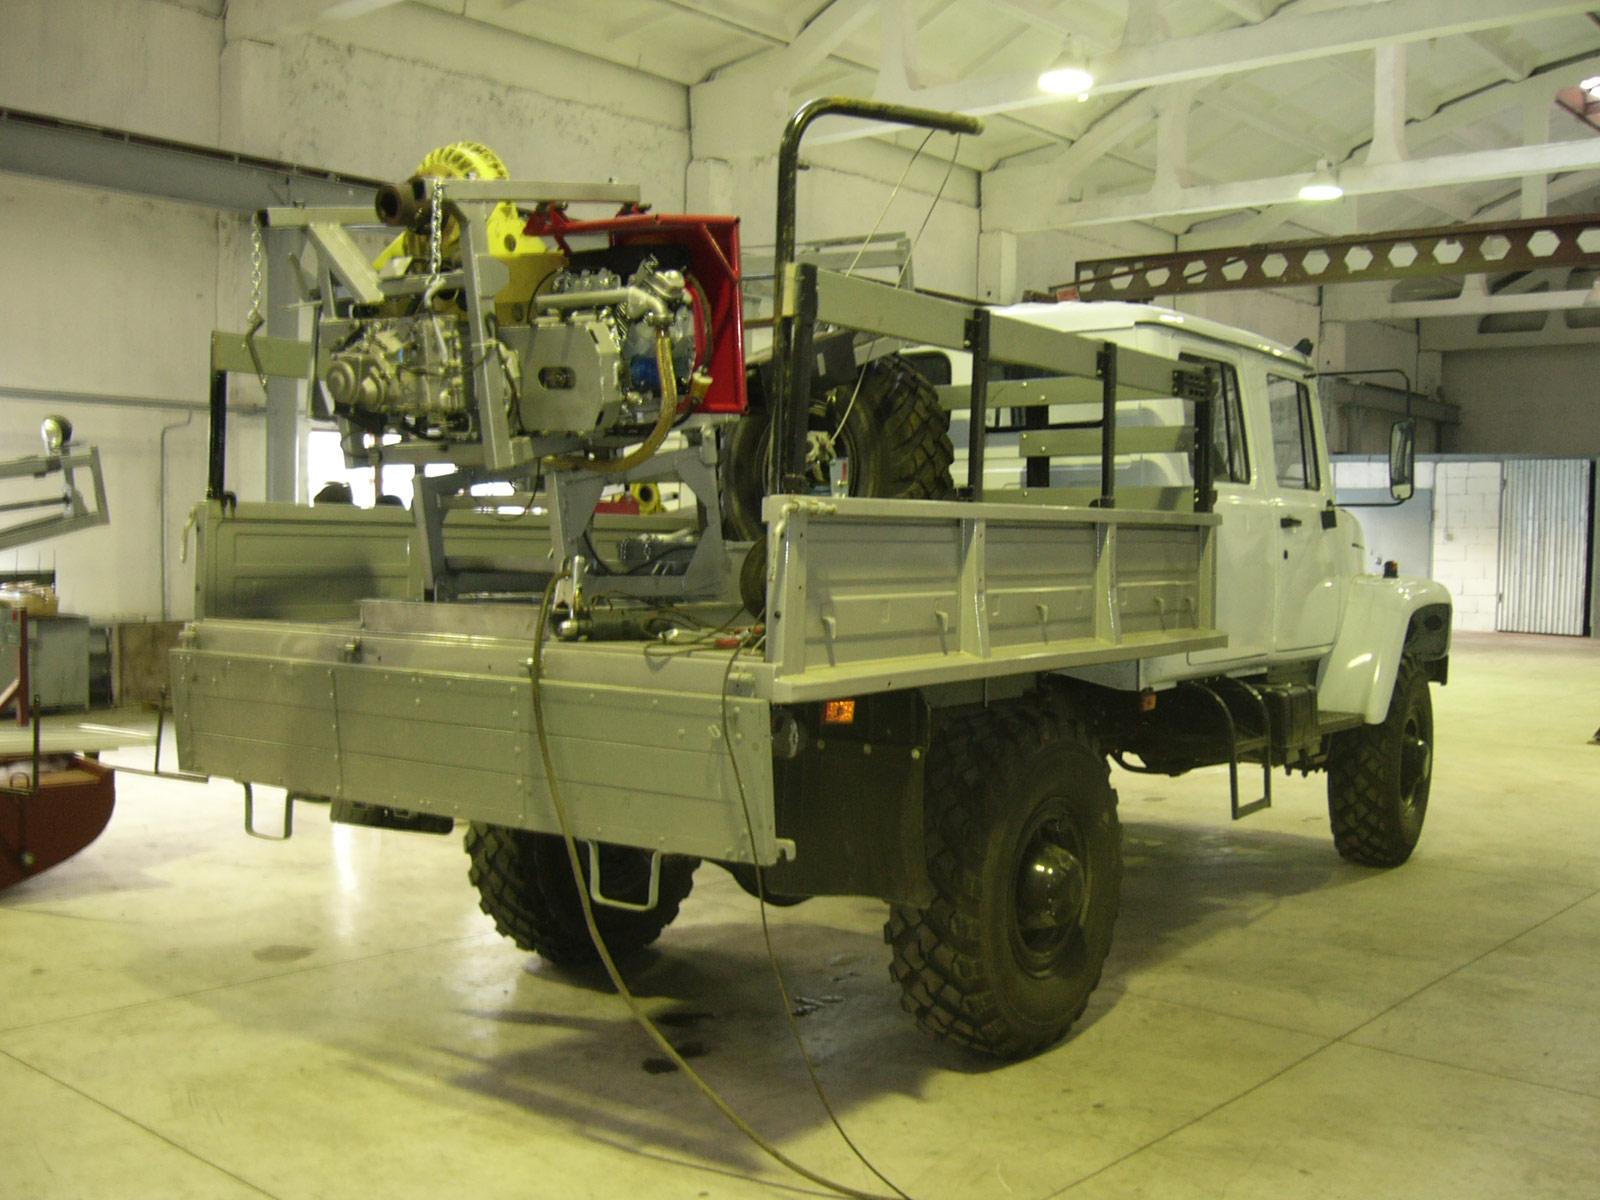 Установка буровая шнековая малогабаритная УБШМ-1-20 на базе ГАЗ-3308